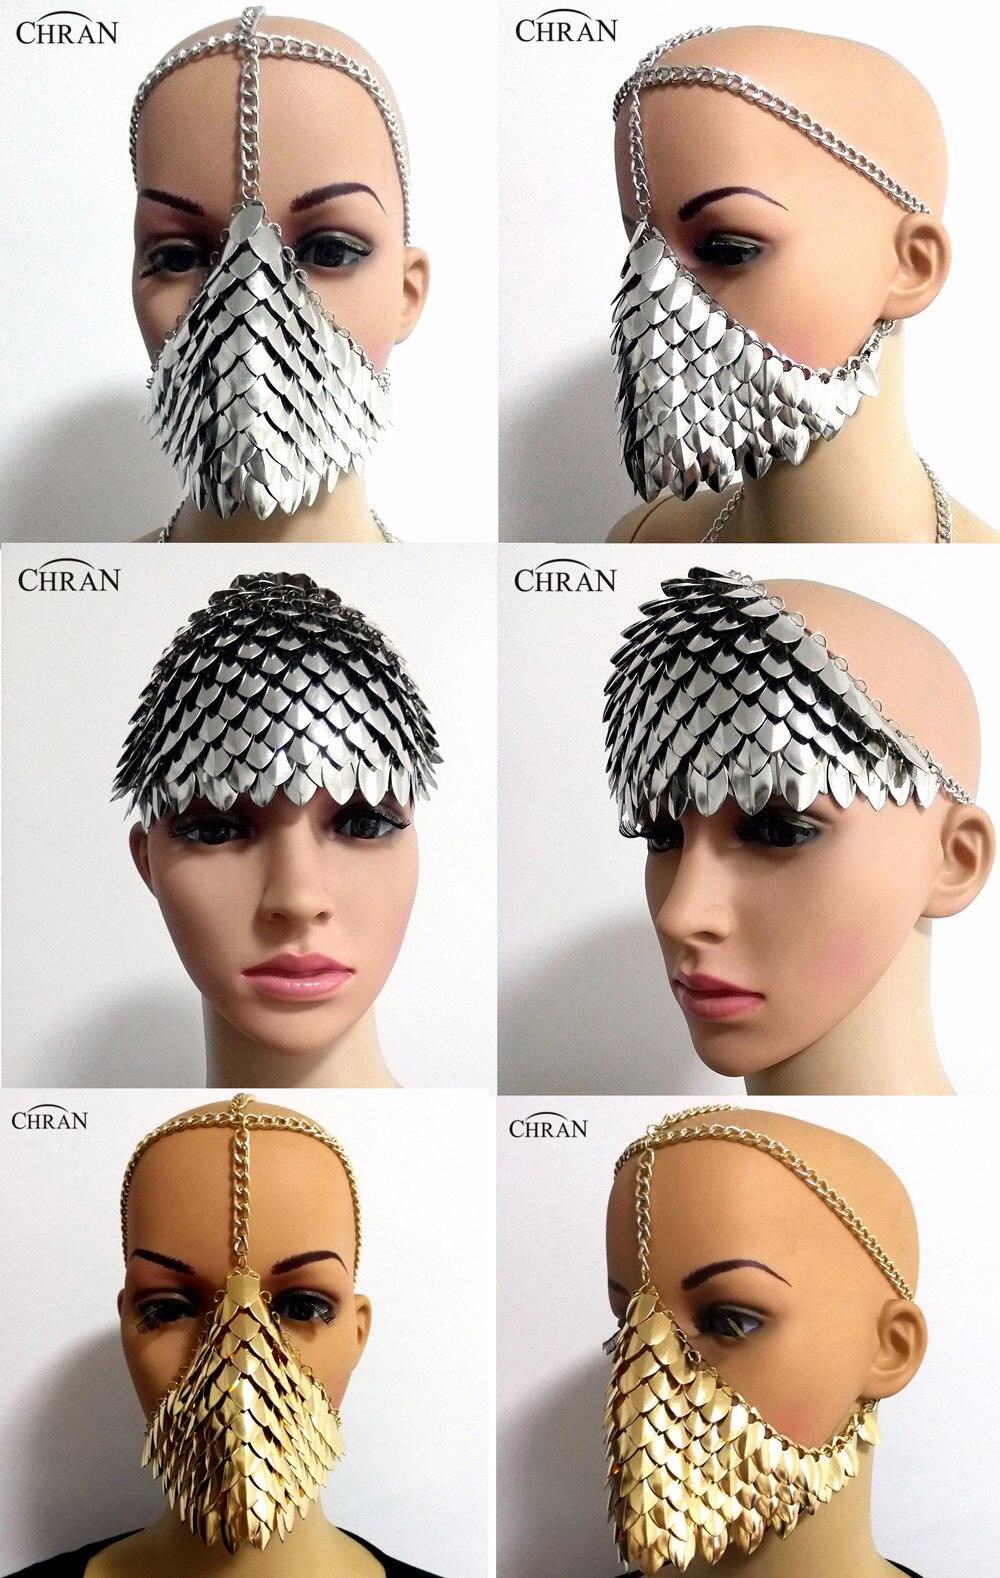 Su comercio tiene que asegurarse sobre que antes de comprar un Chran  Chainmail máscara sujetador Scalemail hombro armadura Cosplay Burning Man  tocado cabeza ... 3e9aa20f9408